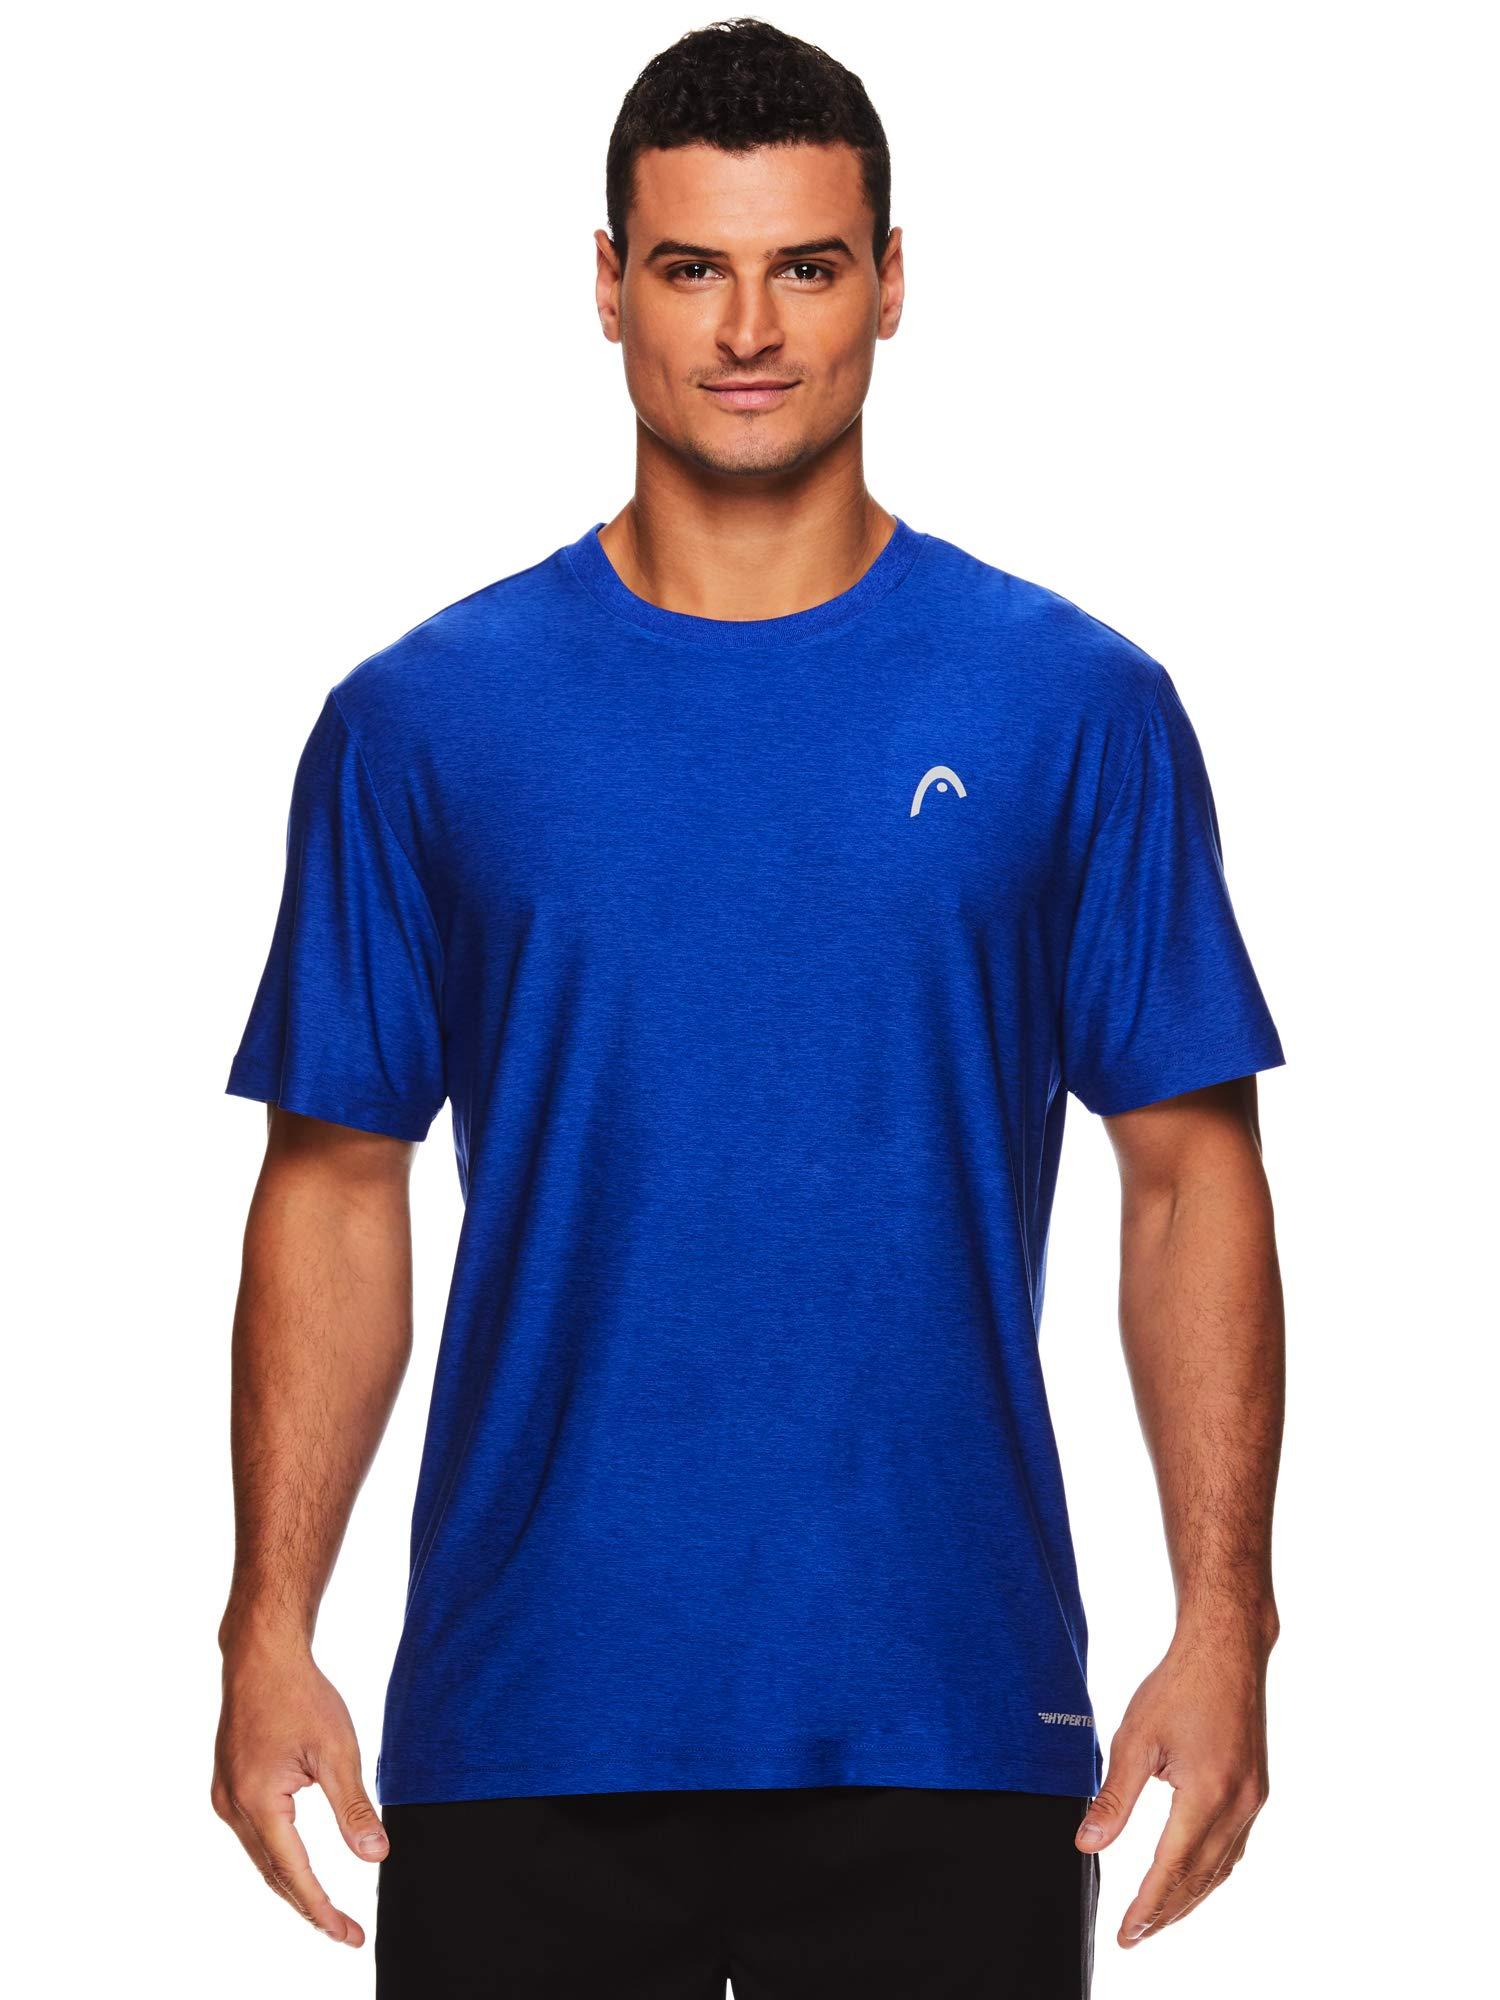 HEAD Men's Hypertek Crewneck Gym Tennis & Workout T-Shirt - Short Sleeve Activewear Top - Score Hypertek Royal Heather, Small